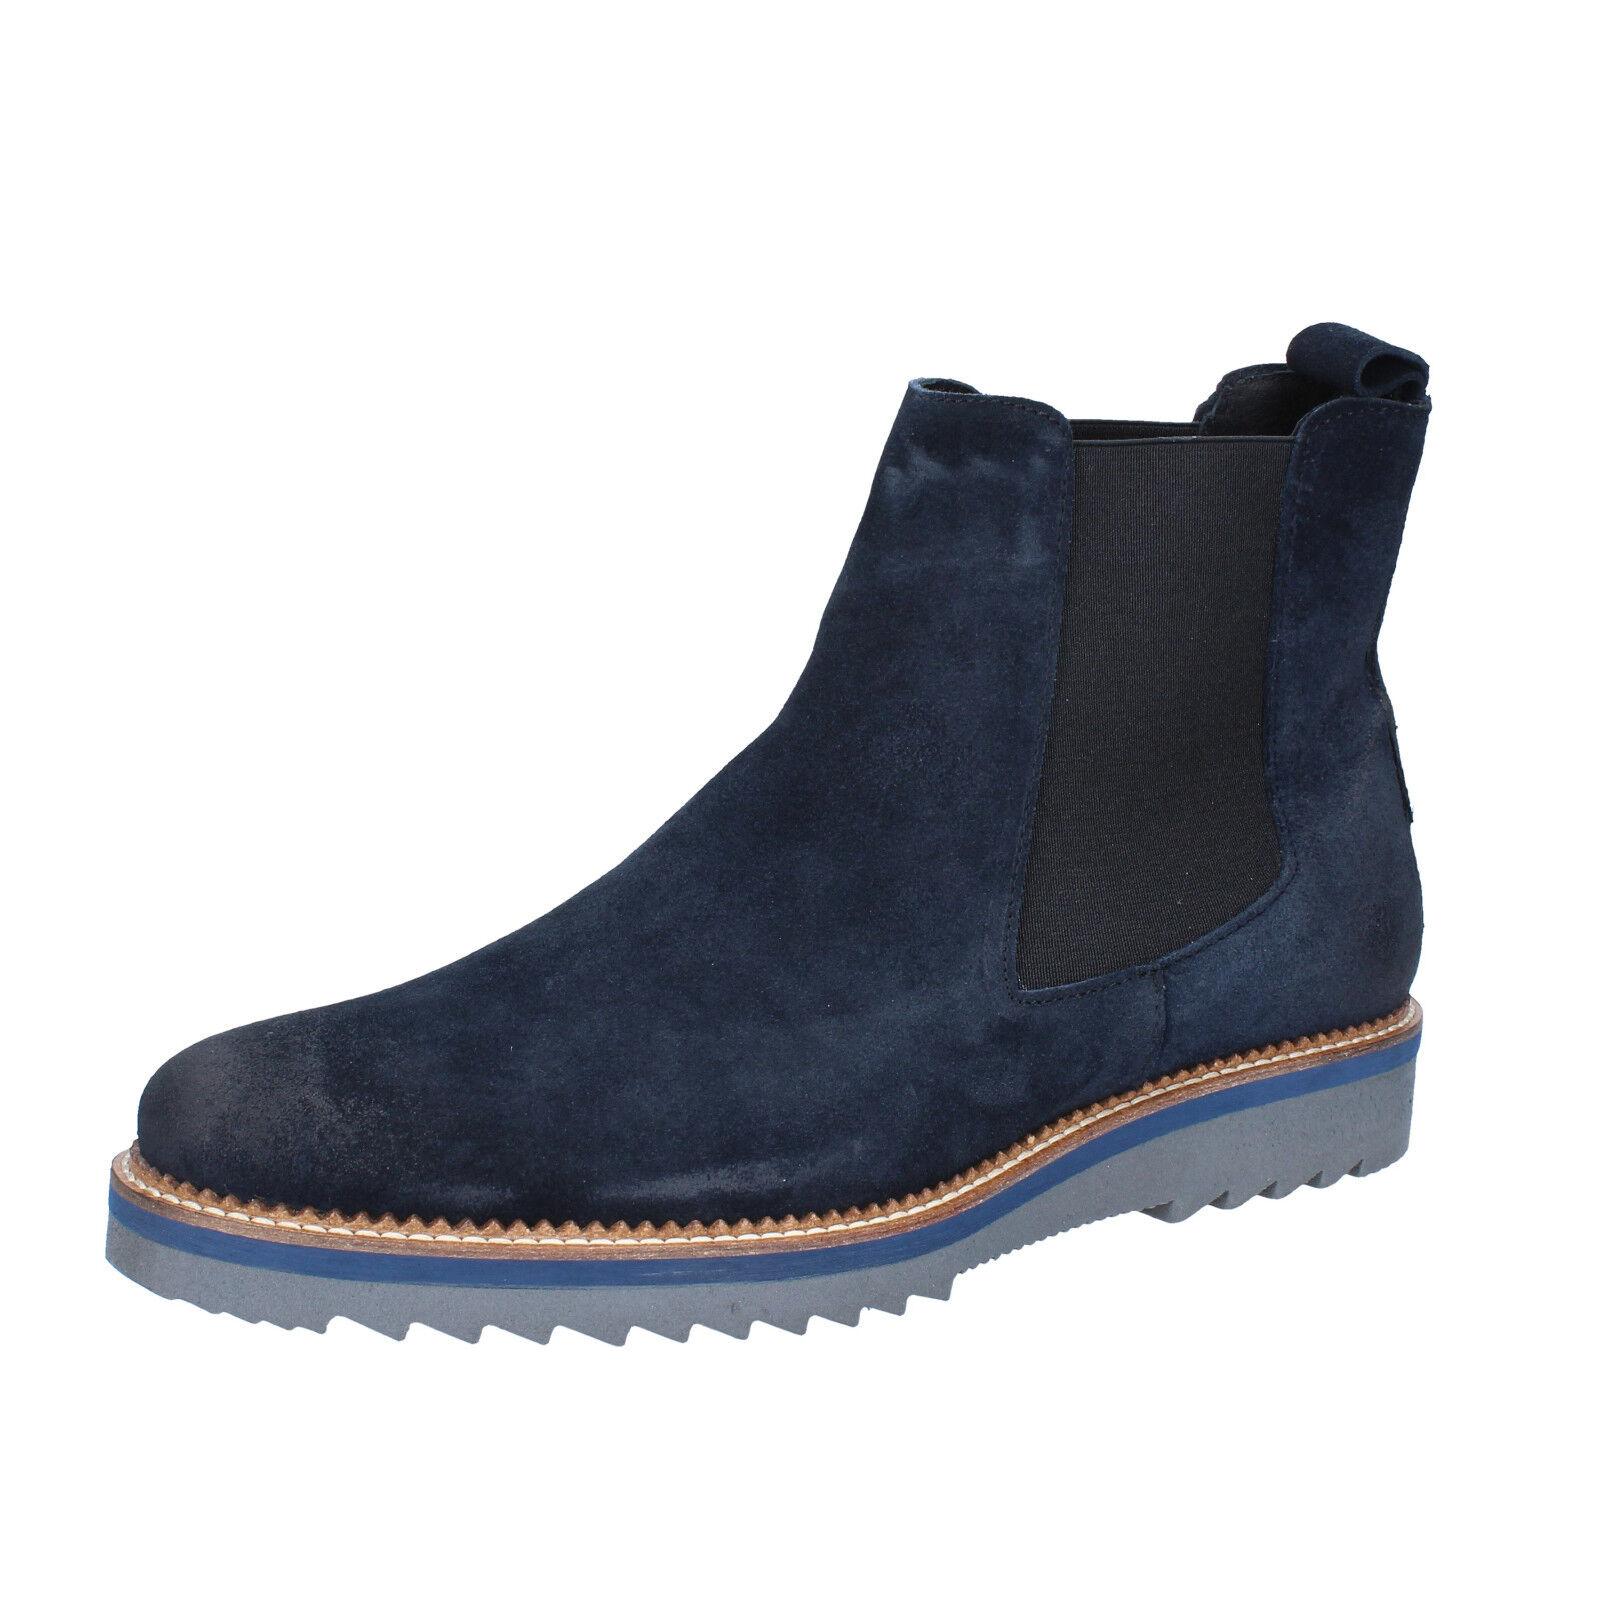 Men's schuhe SALVO BARONE 9 Stiefel (EU 42 ) ankle Stiefel 9 Blau suede BZ142-B 0d1c7d